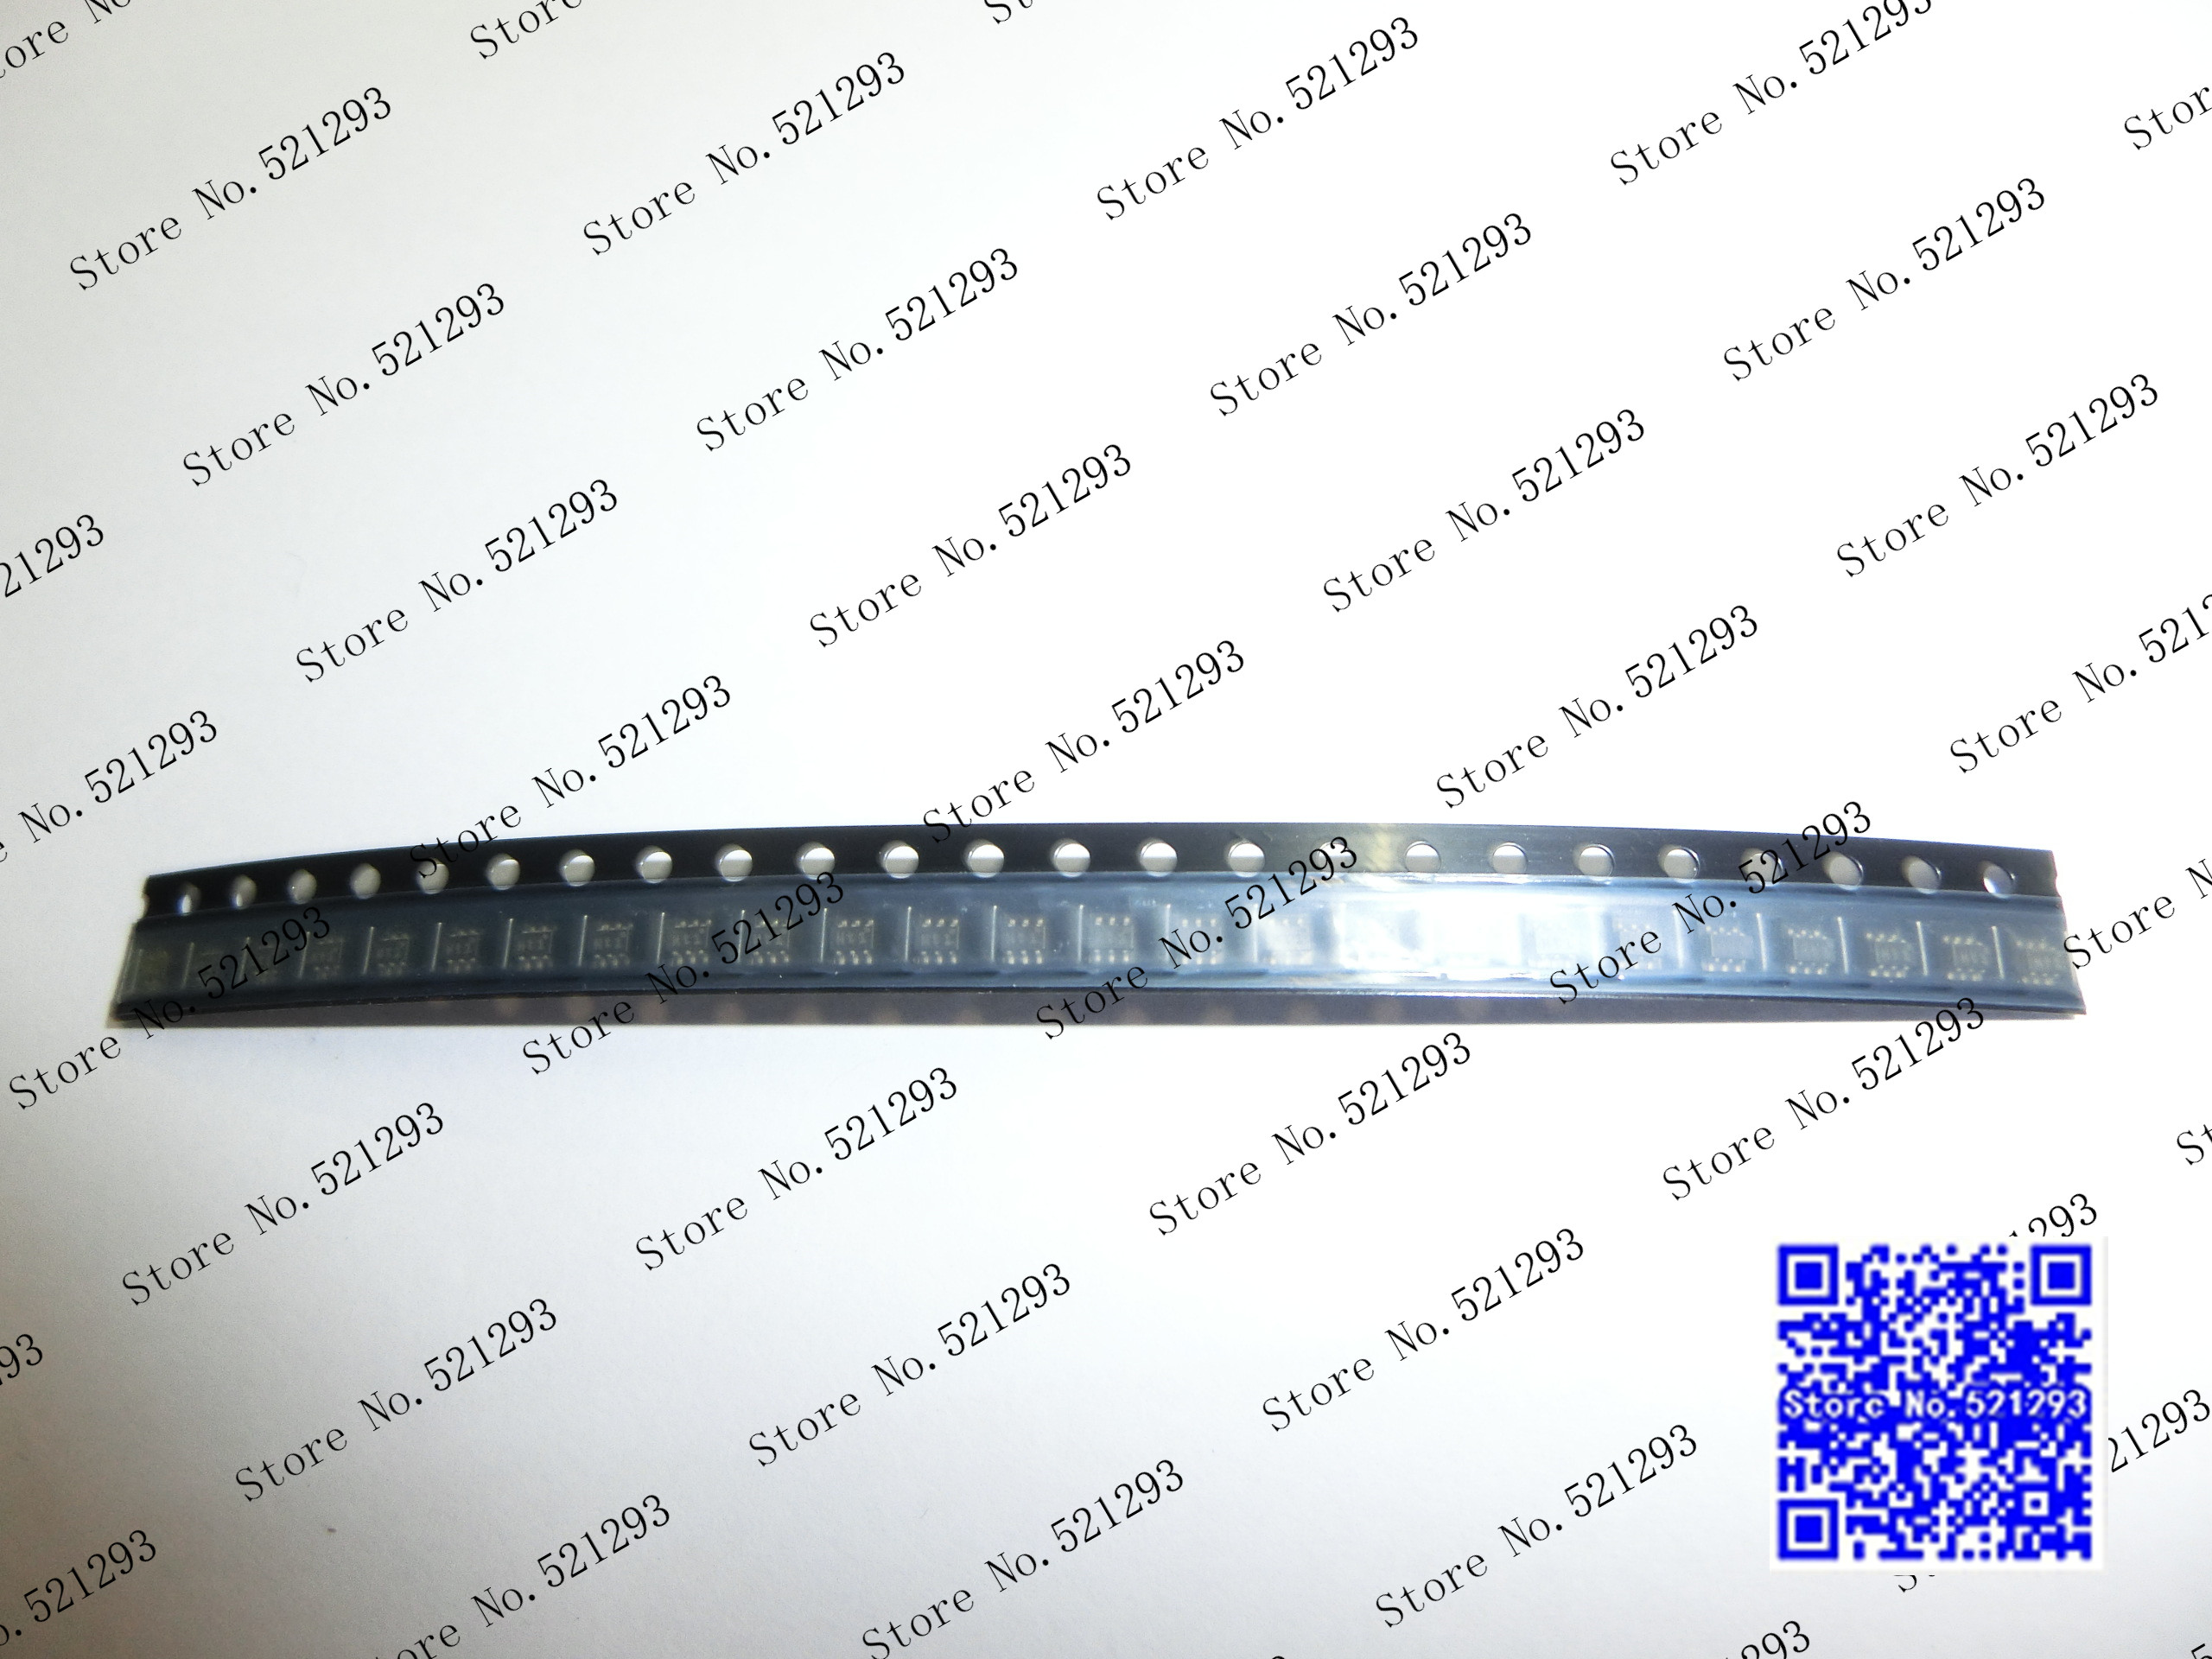 Moc3052s Ta1 Opto Triac 600 Vdrm Max 6smd 3052 30pcs Lot Circuit Pumh11 Sot363 Pumh Umh11 Mh11 50pcs